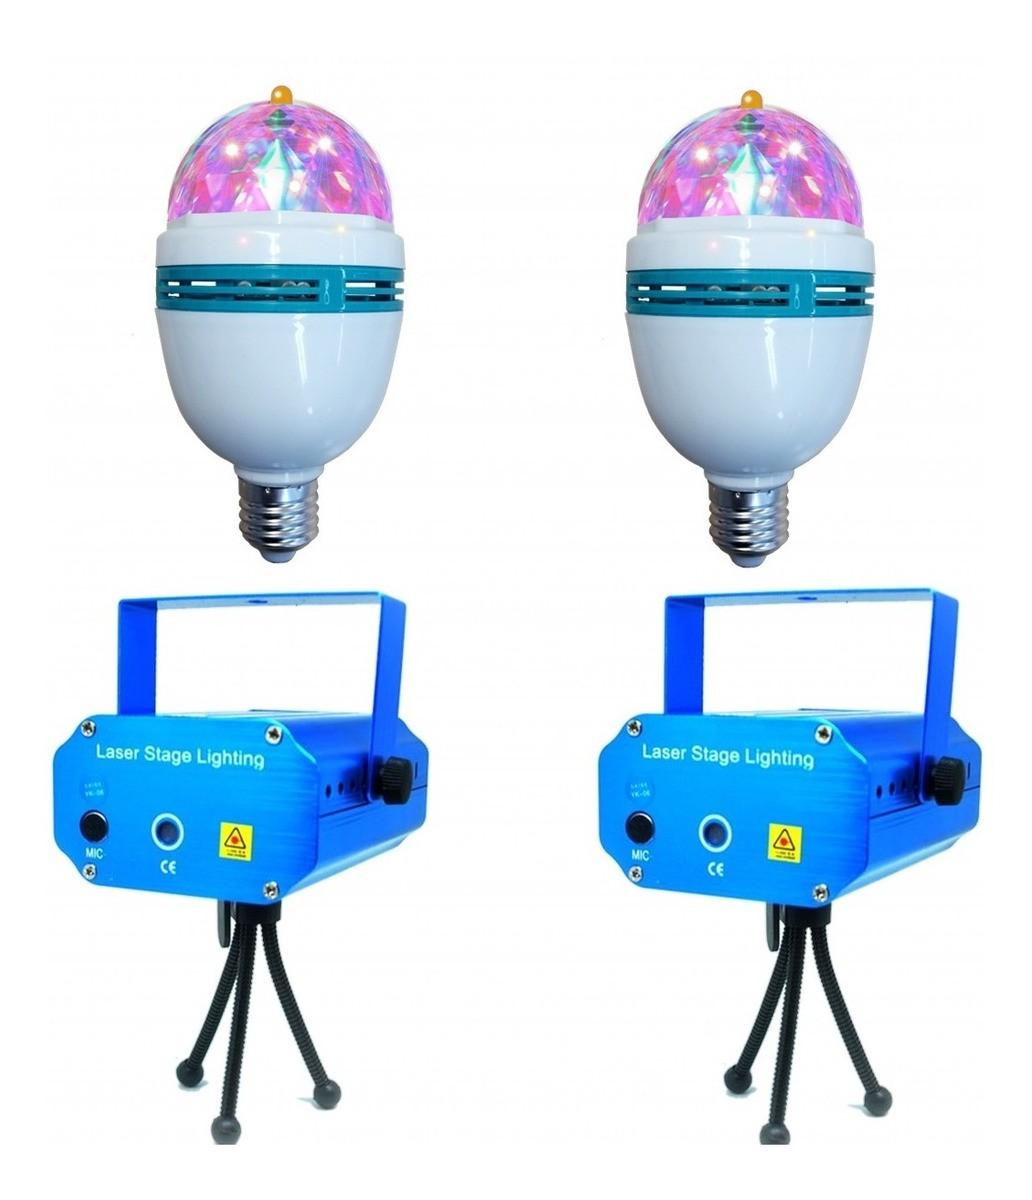 Kit Mini Projetor Holográfico Luz Efeitos Especiais laser